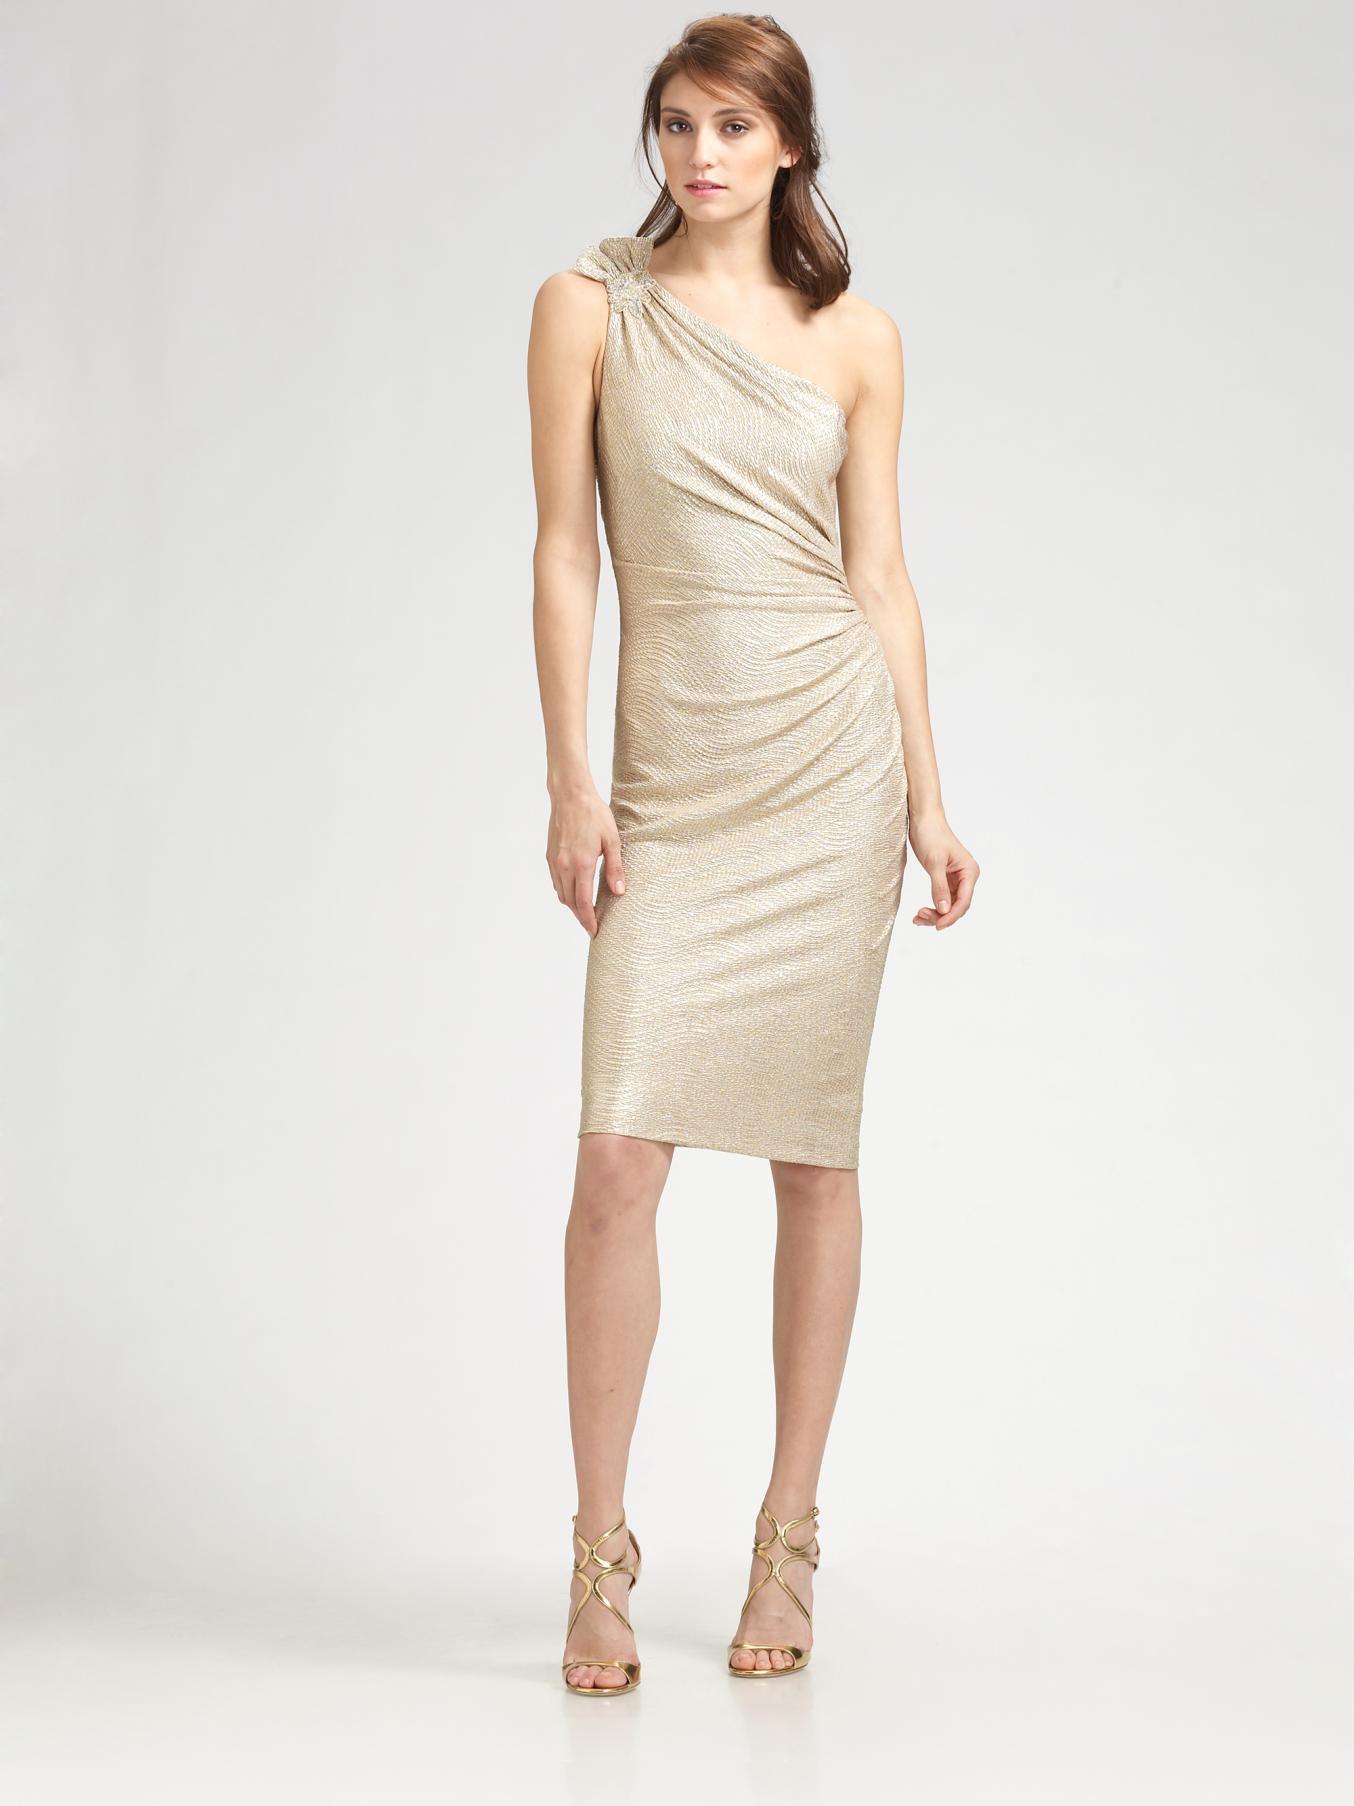 Lyst - David Meister Matelasse One Shoulder Dress in Metallic